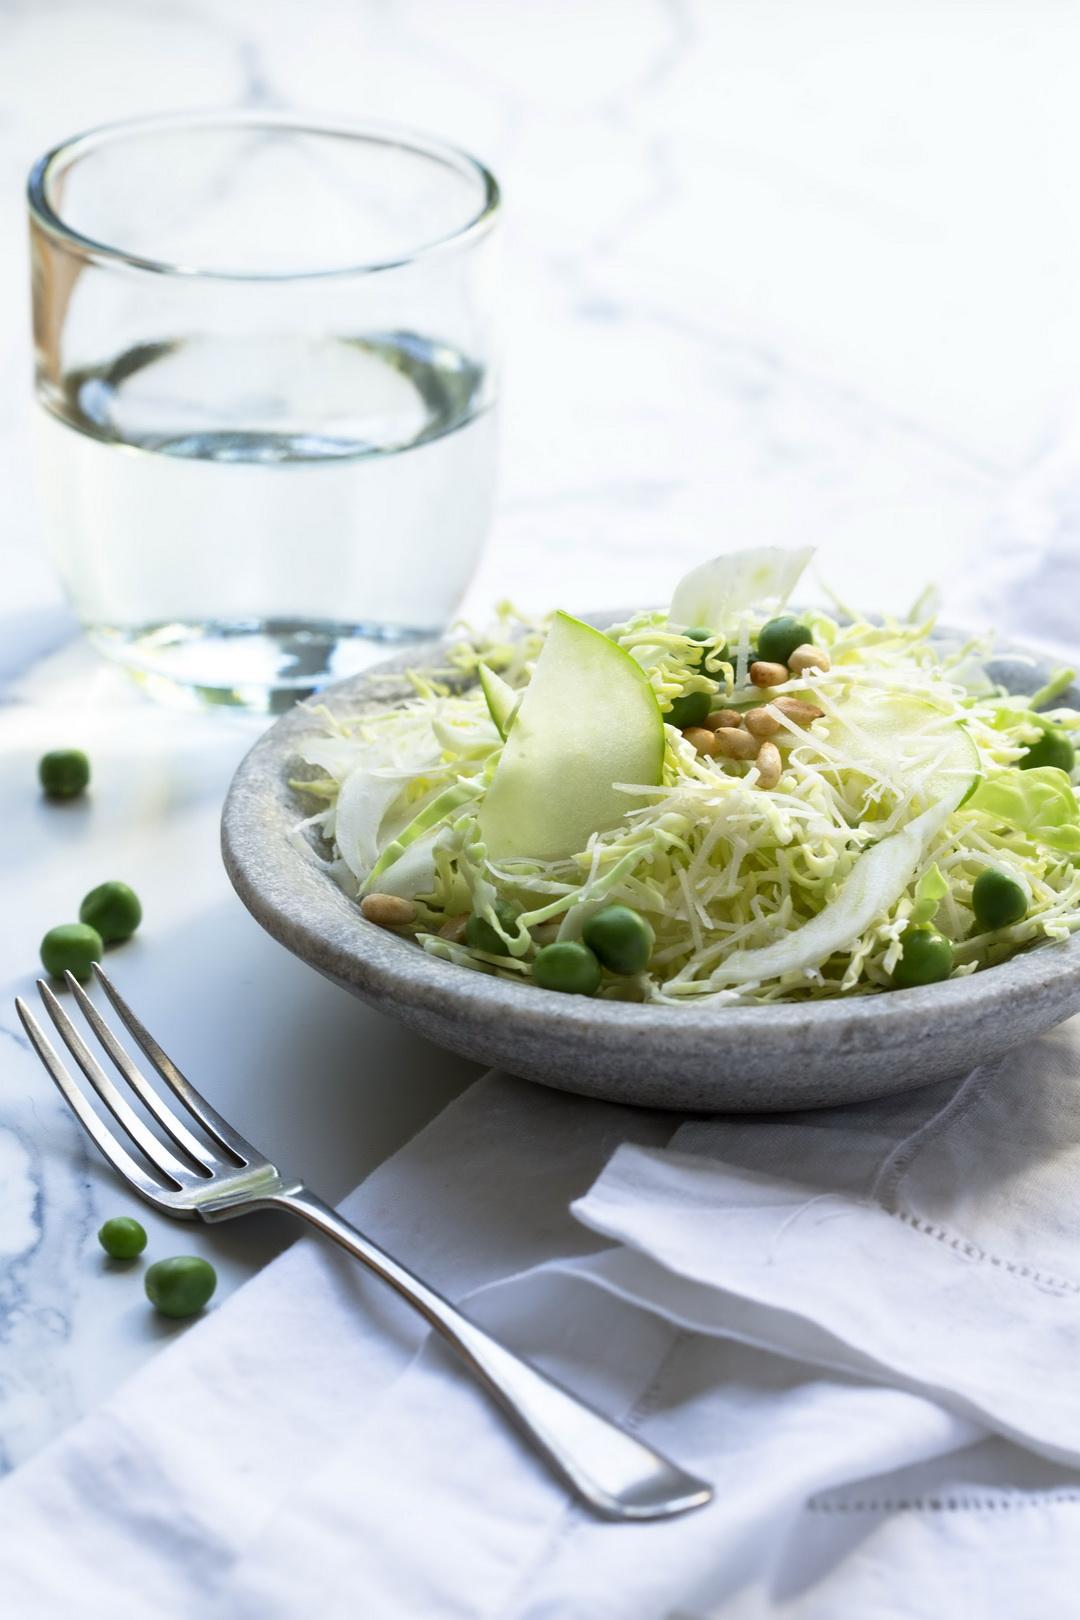 The Urban Nest - Spring Italian Cabbage Salad